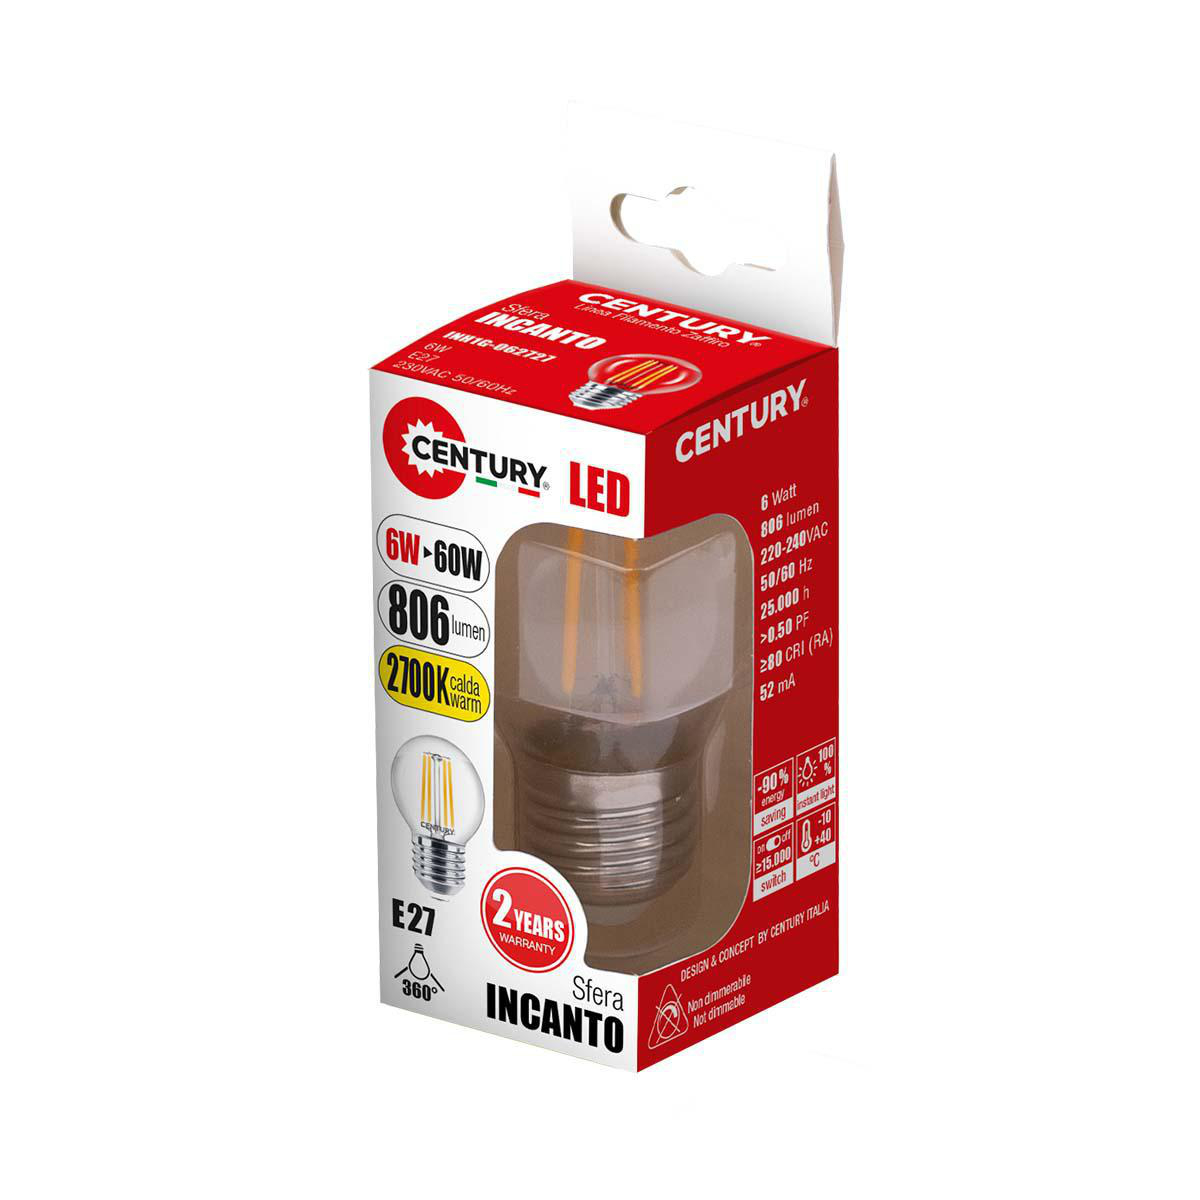 LED Vintage Filament Lampe Sfera E27 6 W 806 lm 2700 K